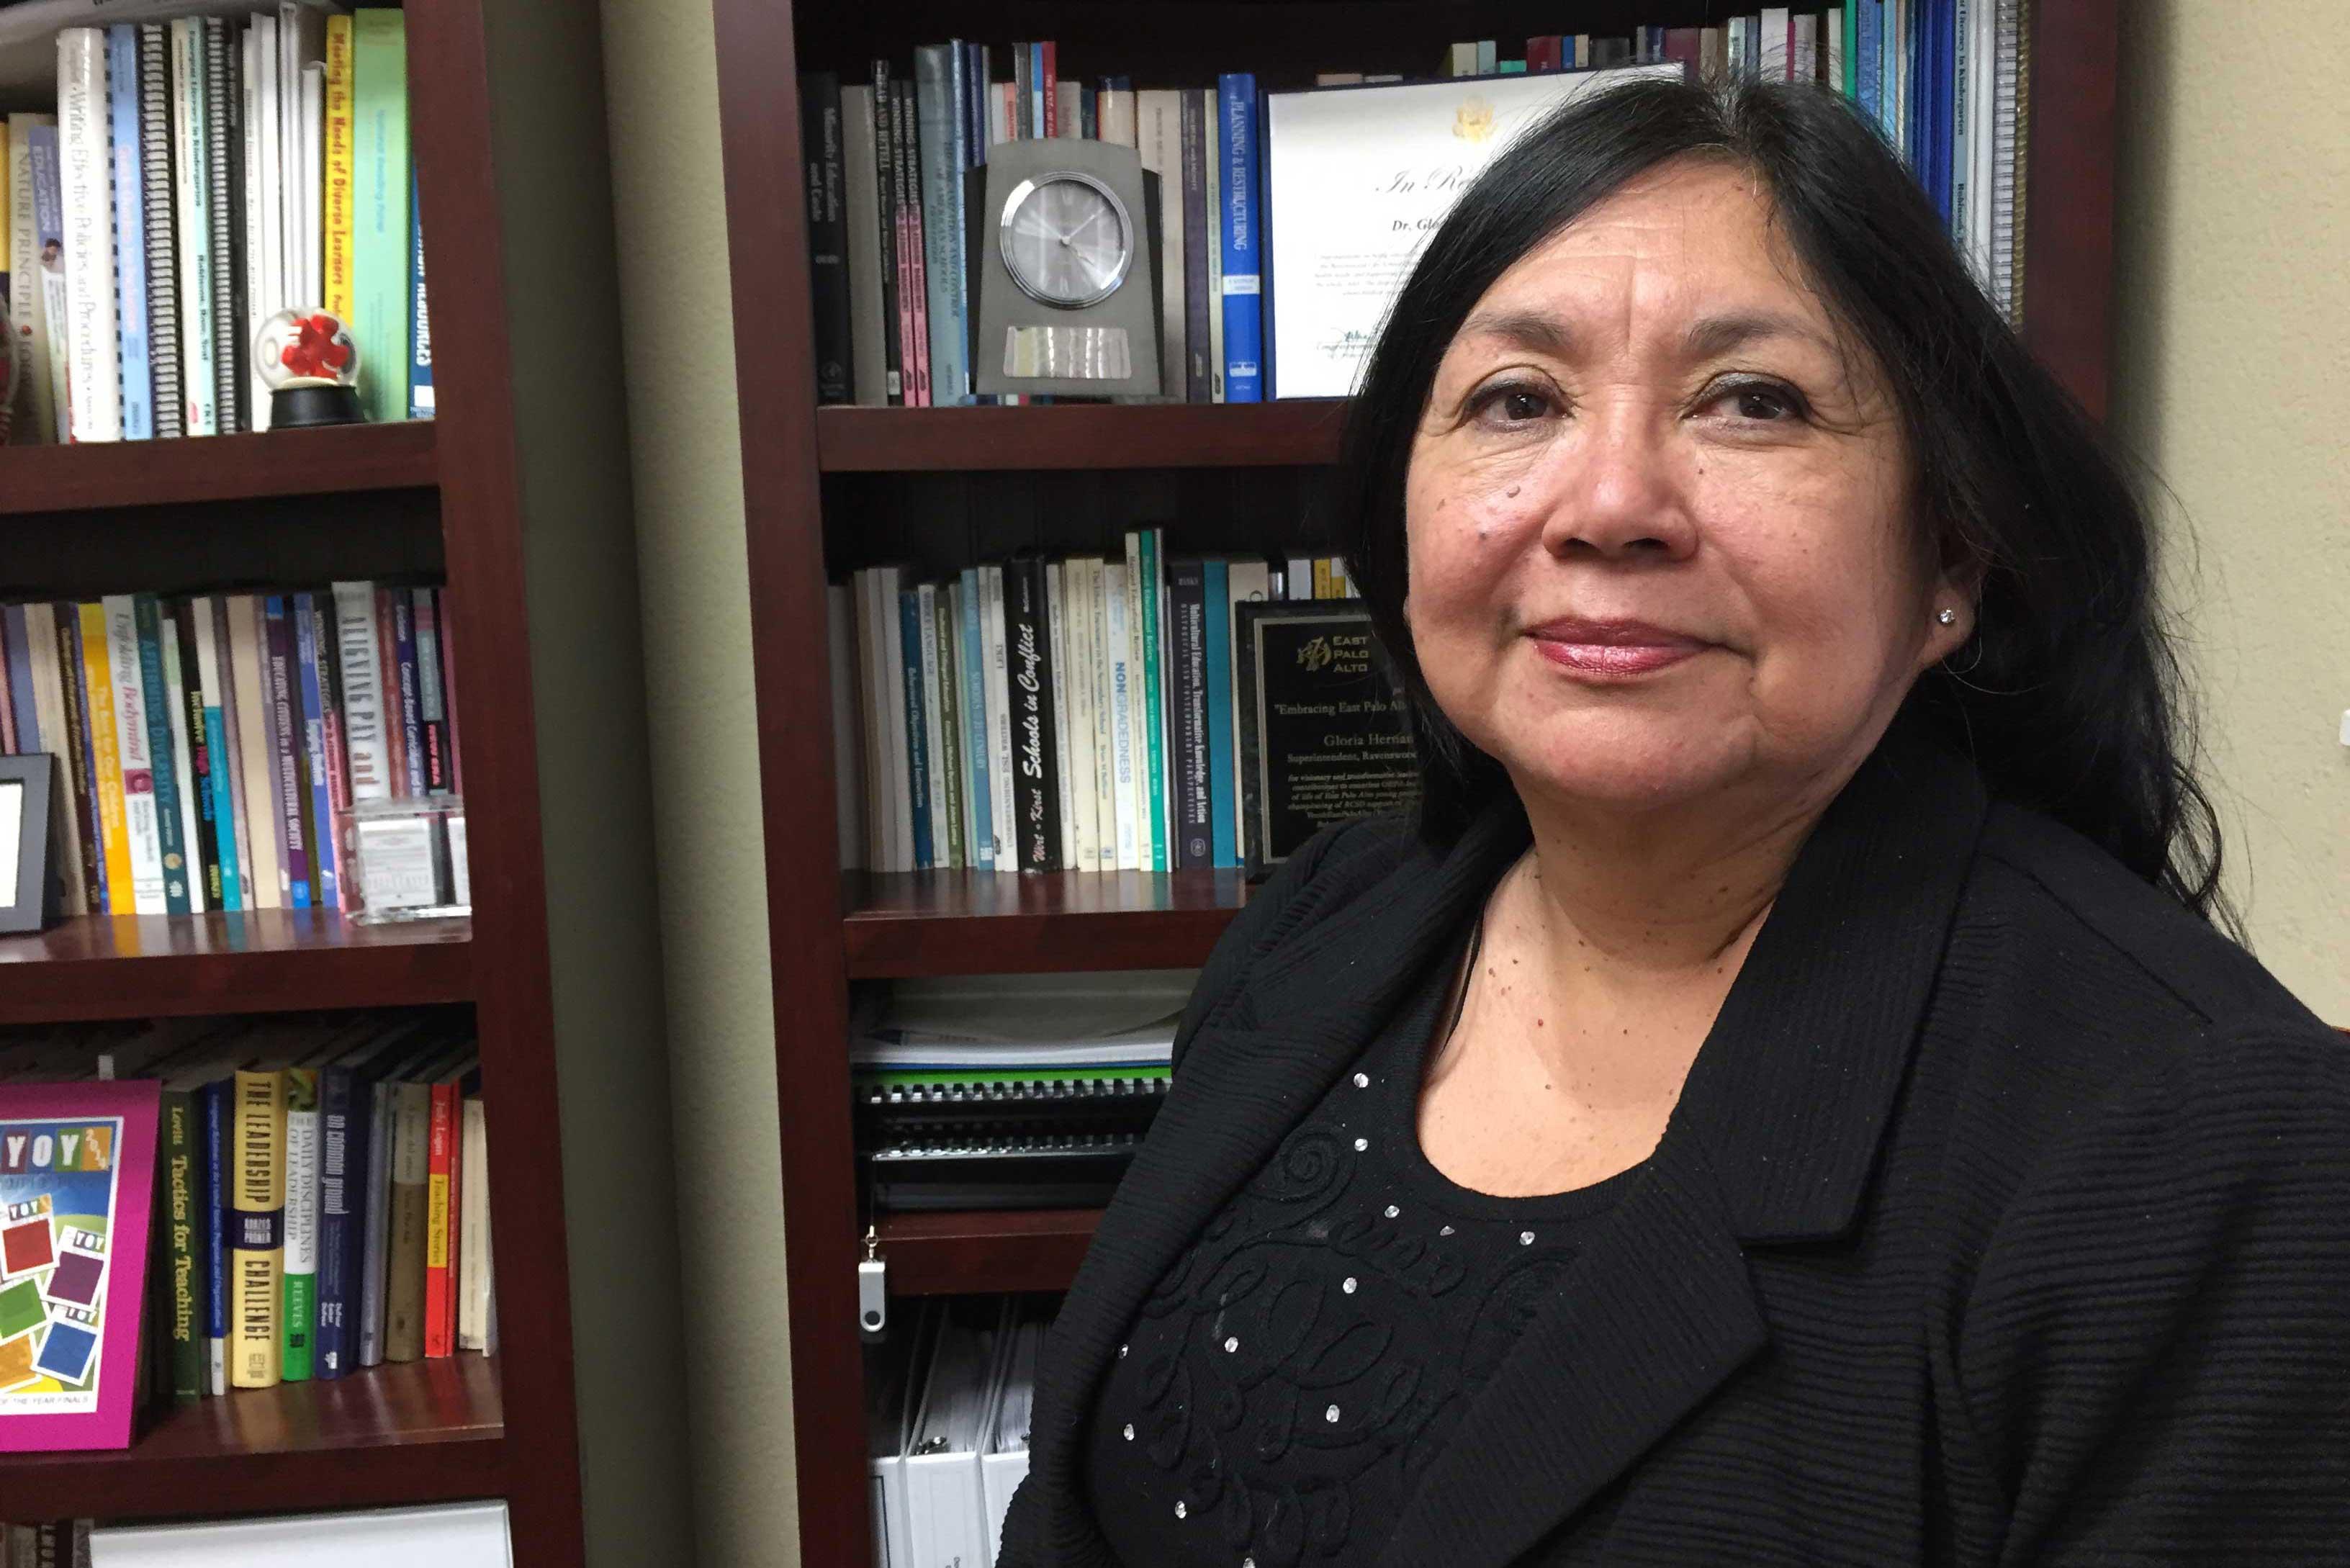 Menlo Park City School District Superintendent